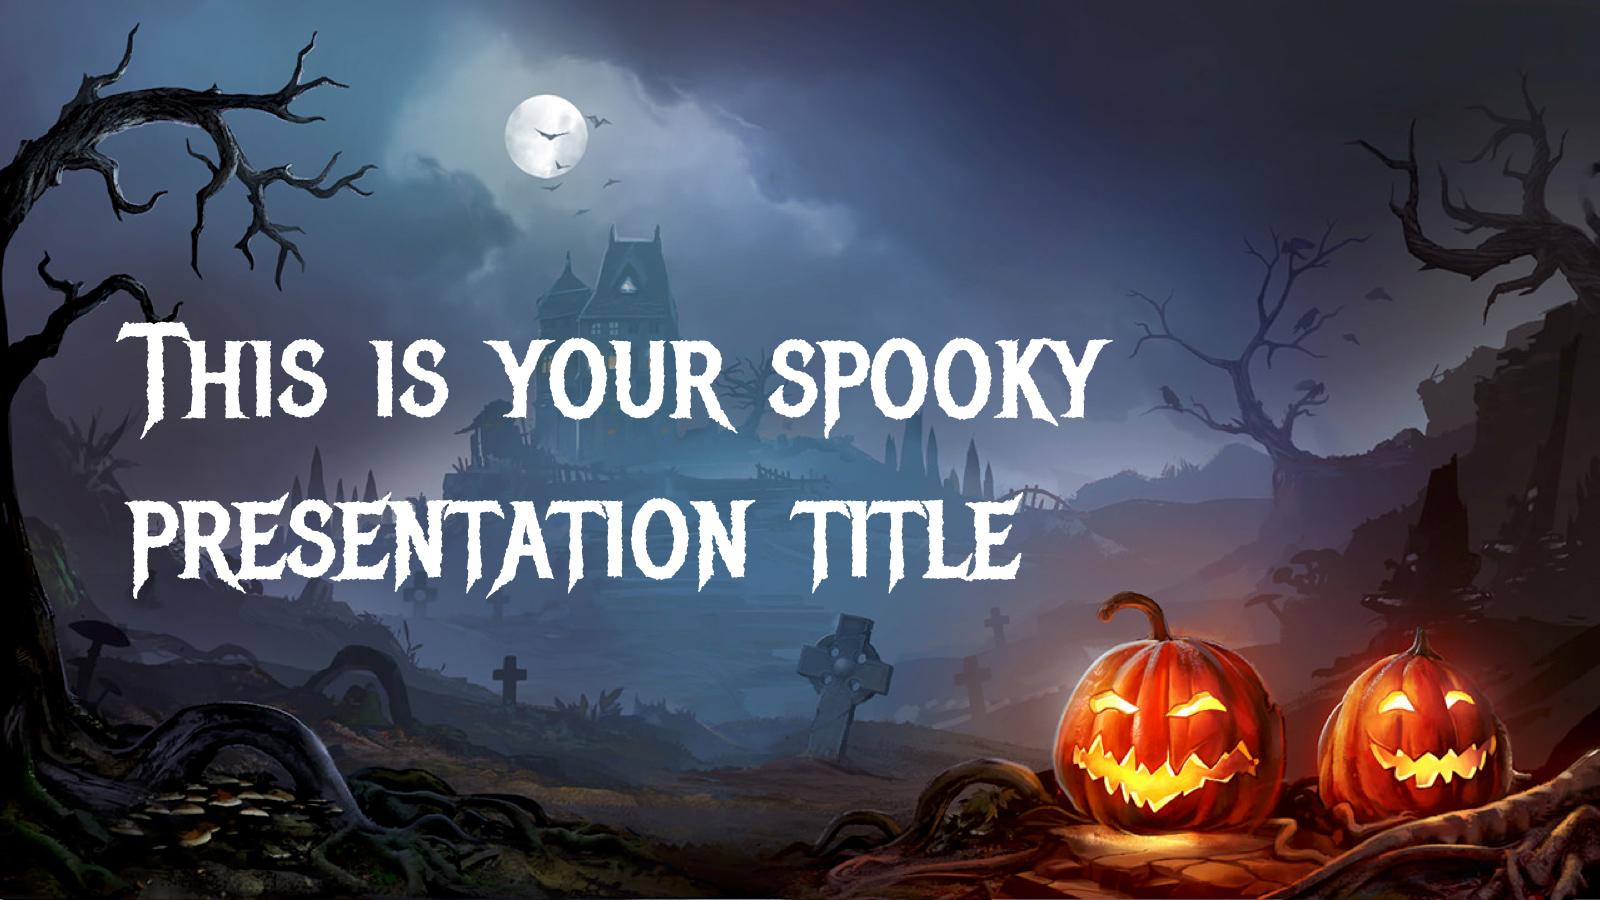 Halloween 2017 free powerpoint template google slides theme halloween 2017 free powerpoint template google slides theme toneelgroepblik Gallery